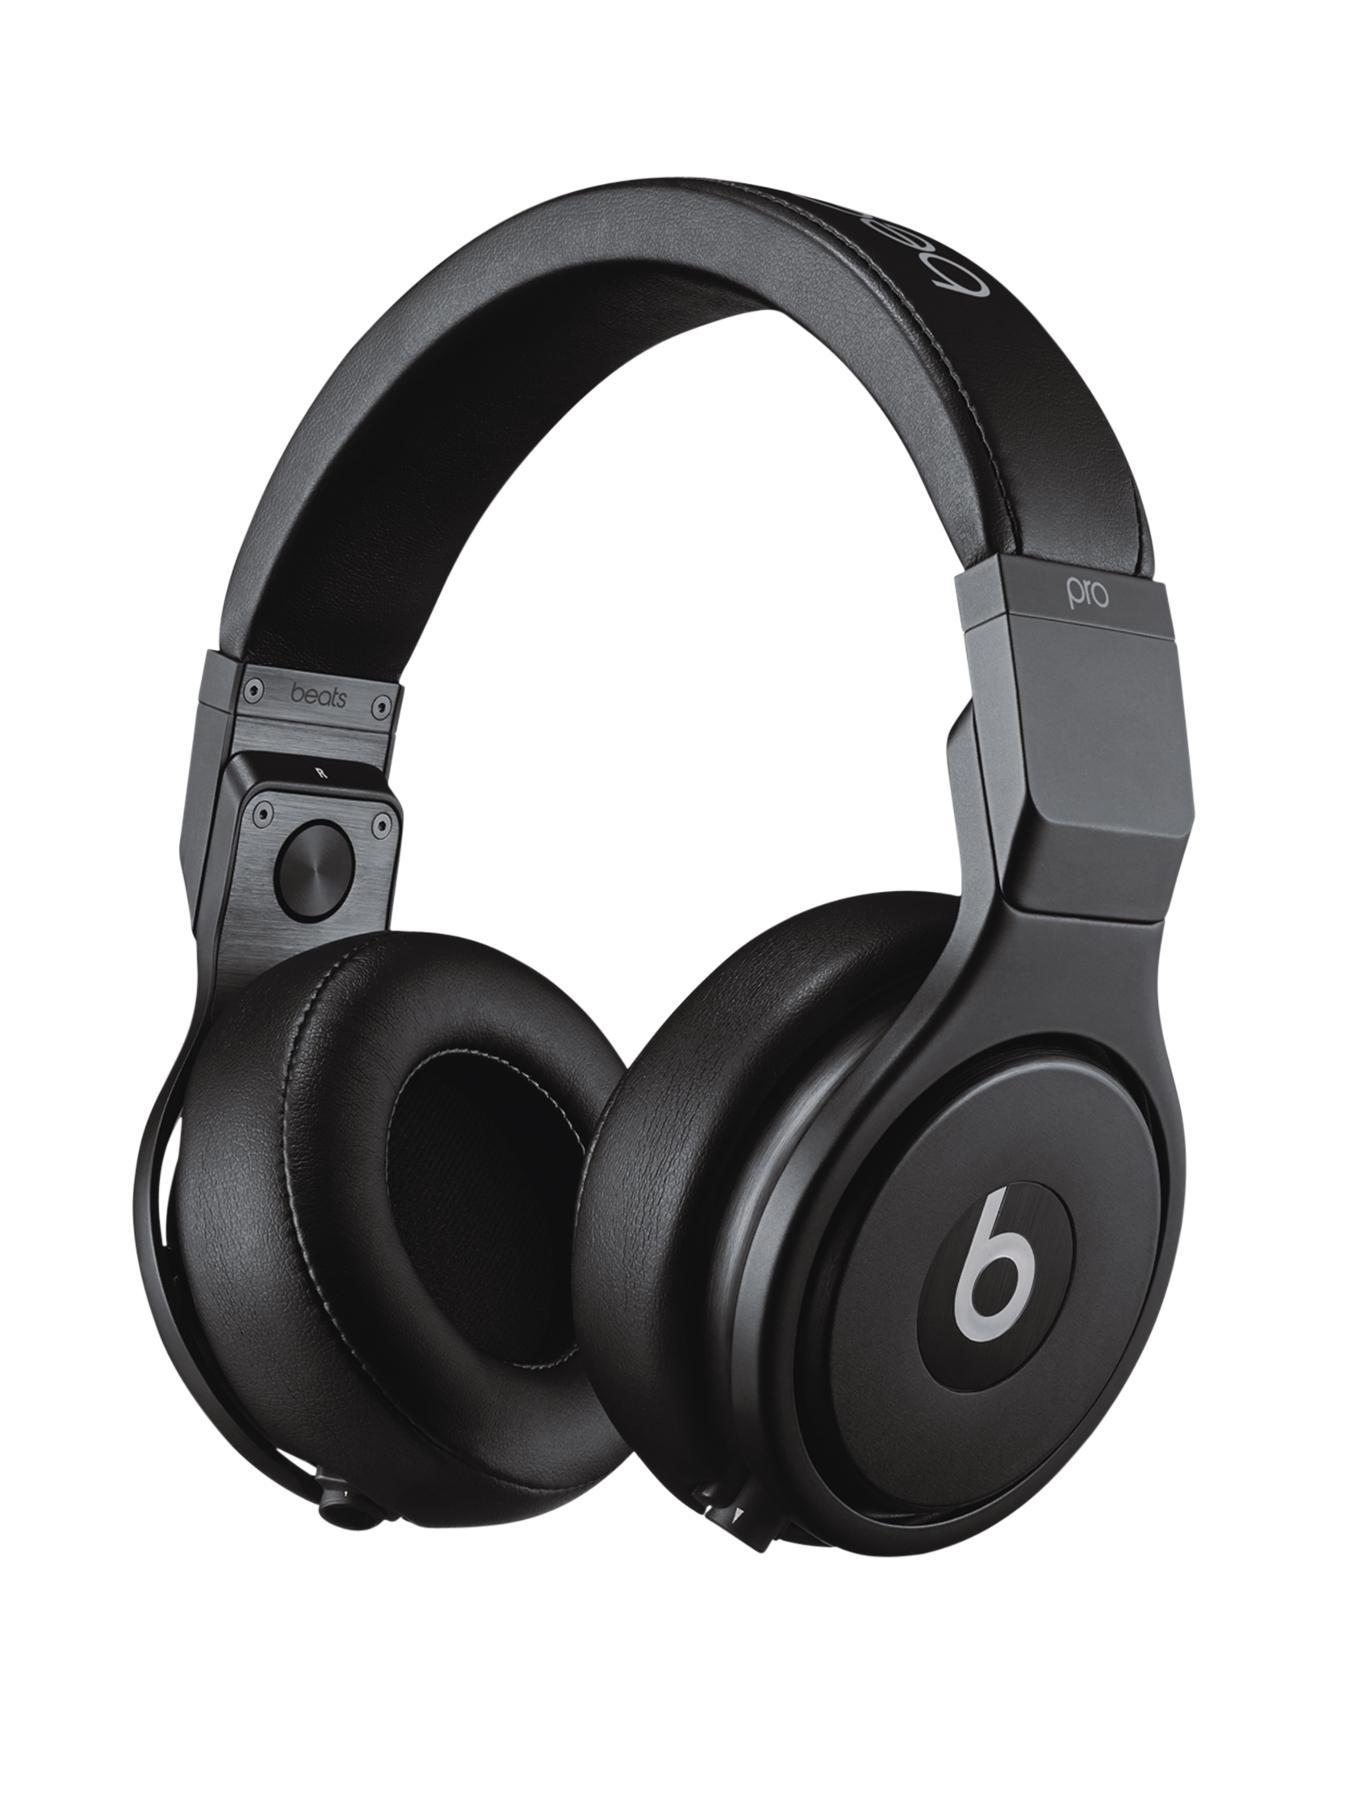 Beats by Dr Dre Pro Infinite Headphones - Black